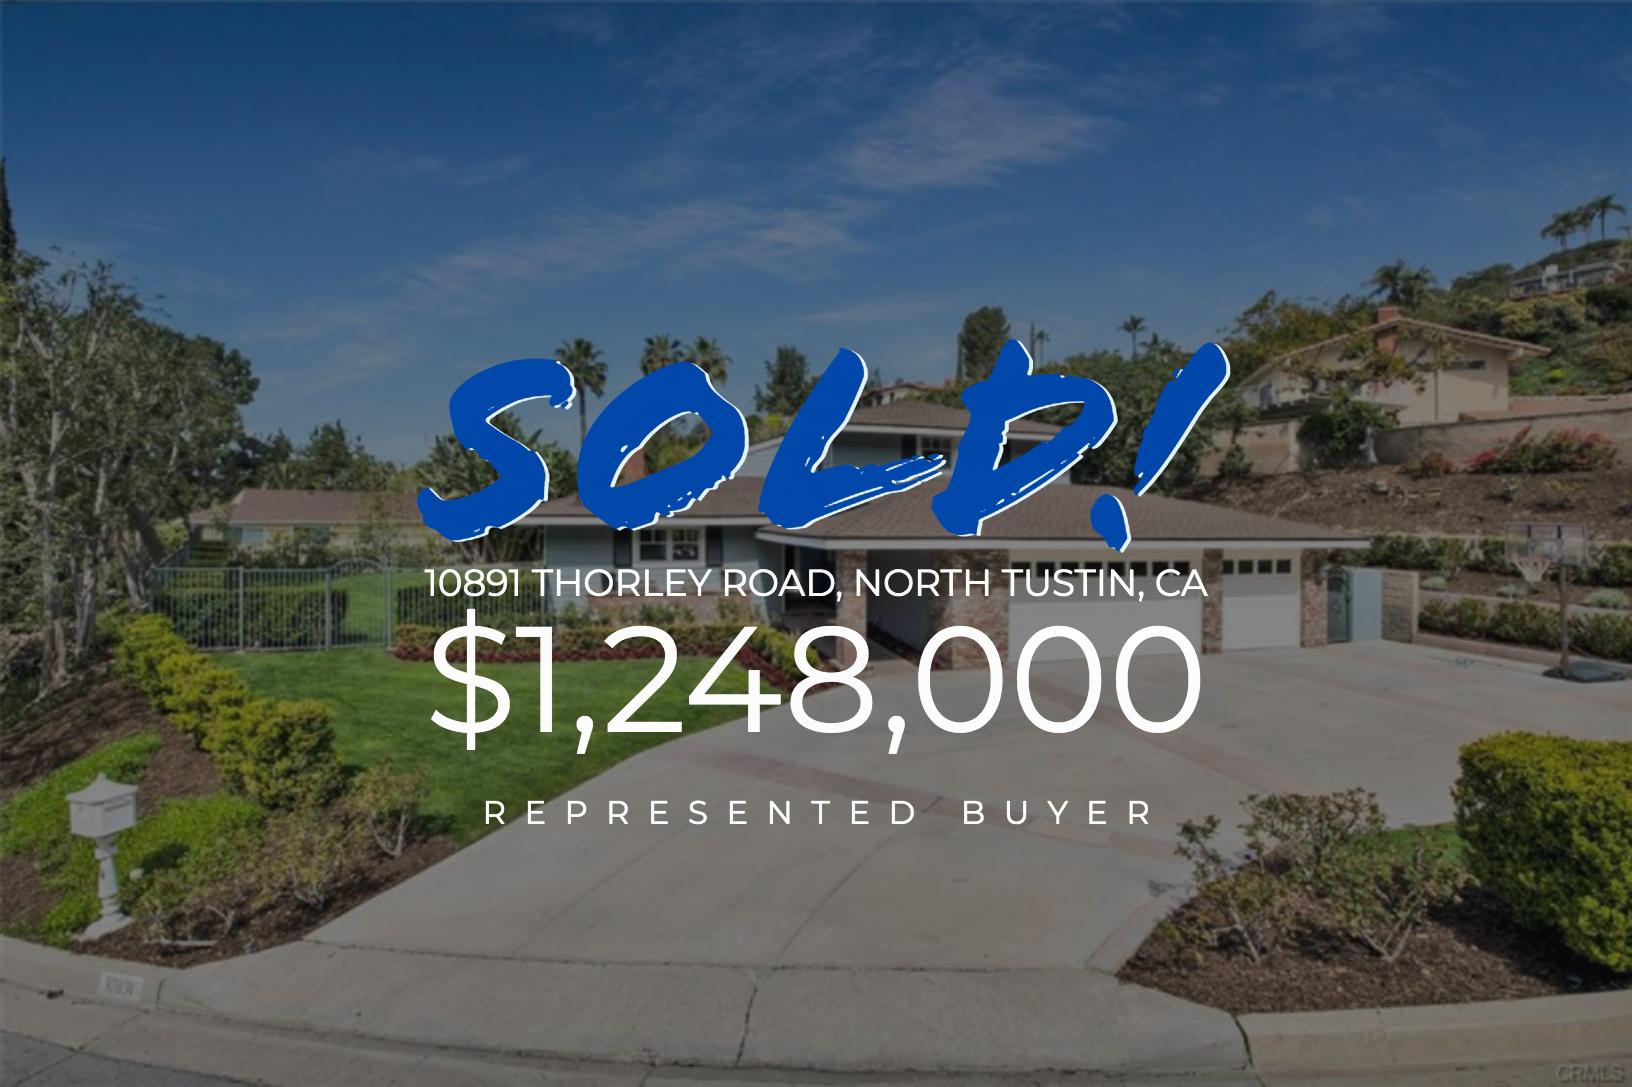 Sold With Matt Blashaw 10891 Thorley Road in North Tustin, CA